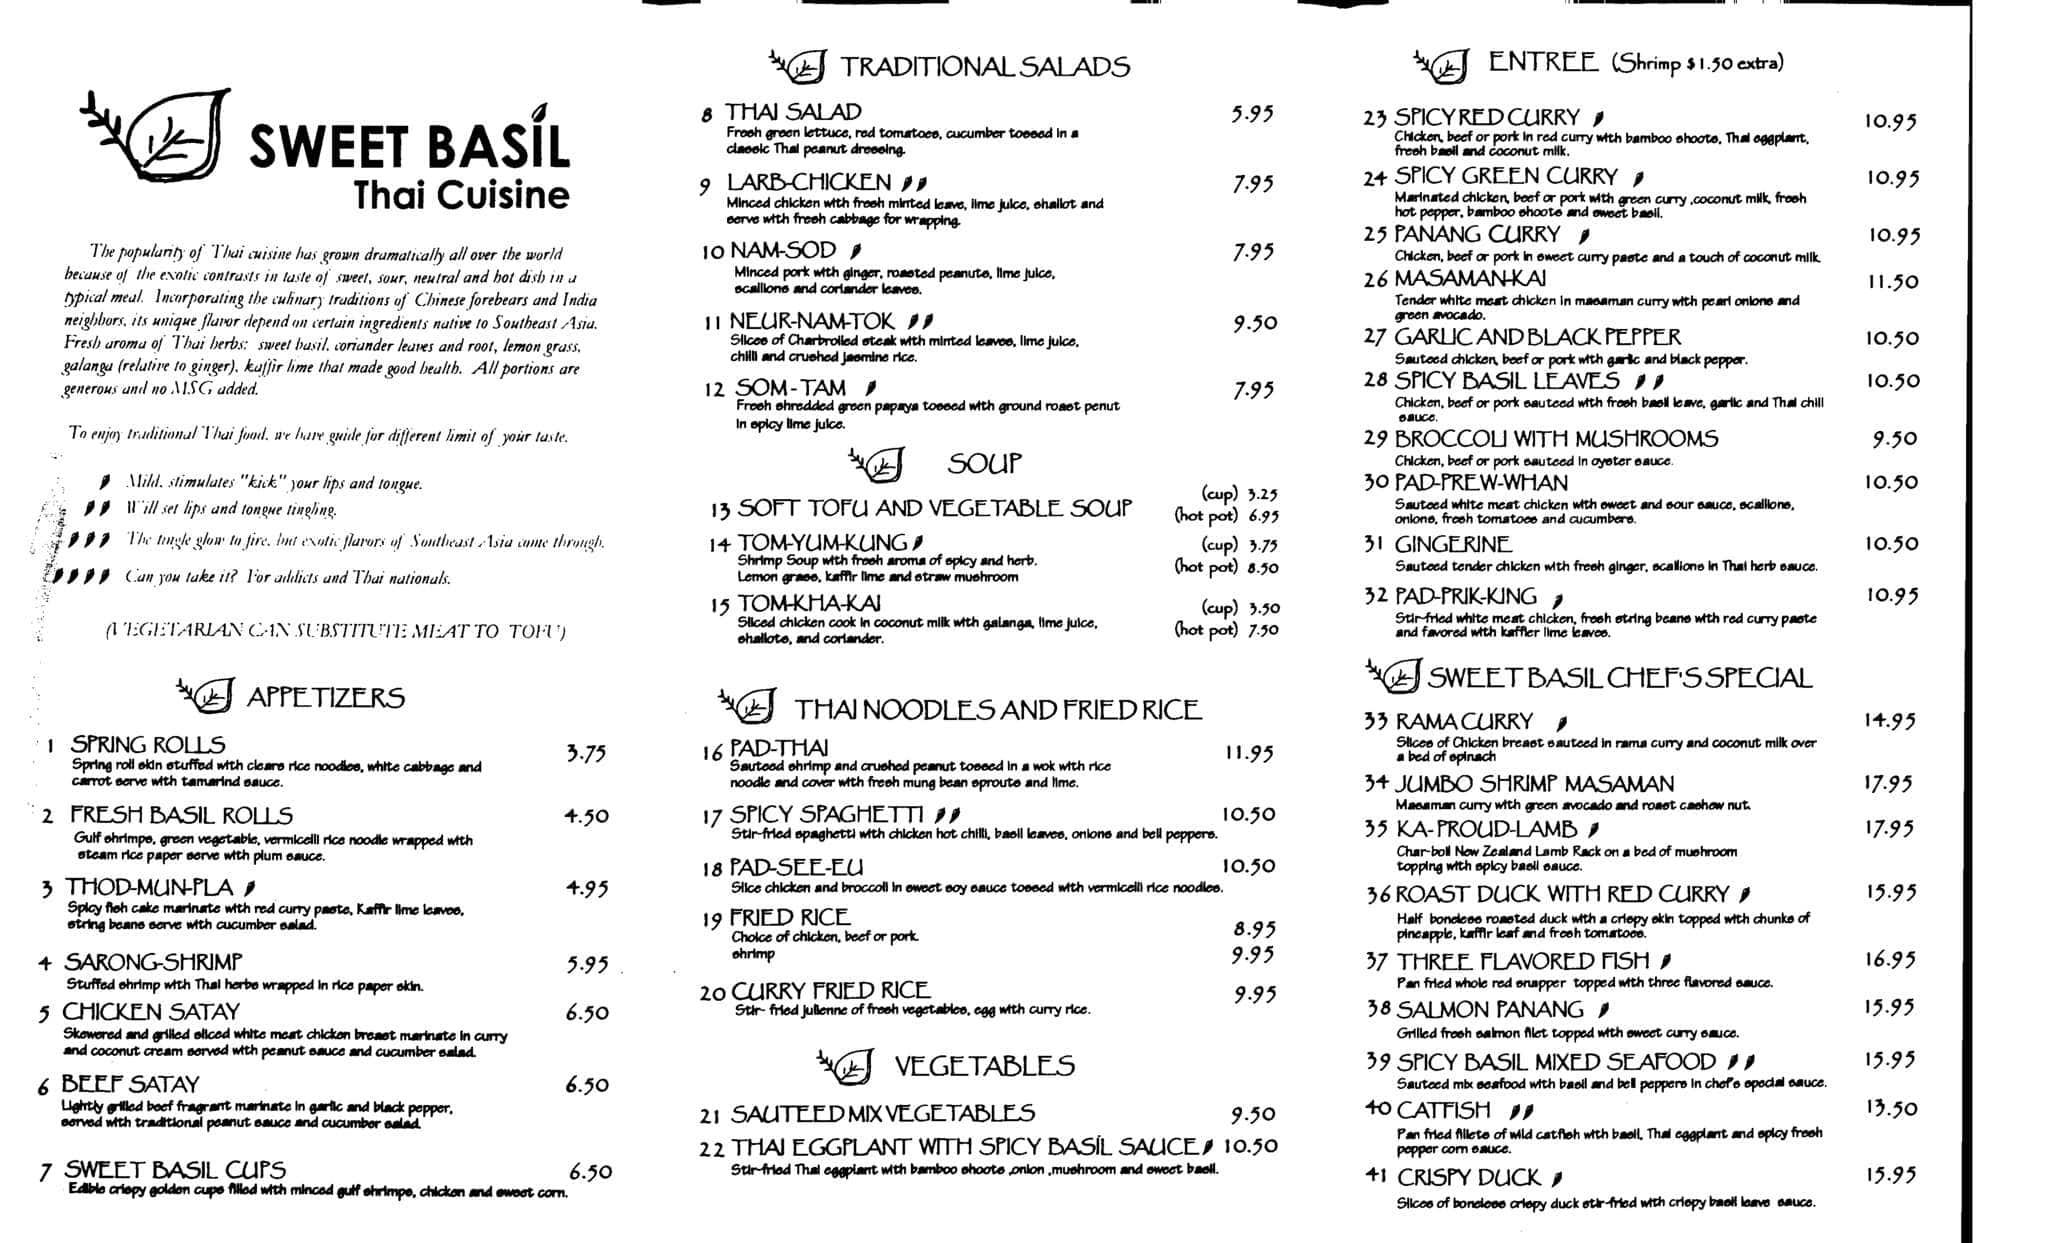 Sweet Basil Thai Cuisine Menu, Menu for Sweet Basil Thai Cuisine ...